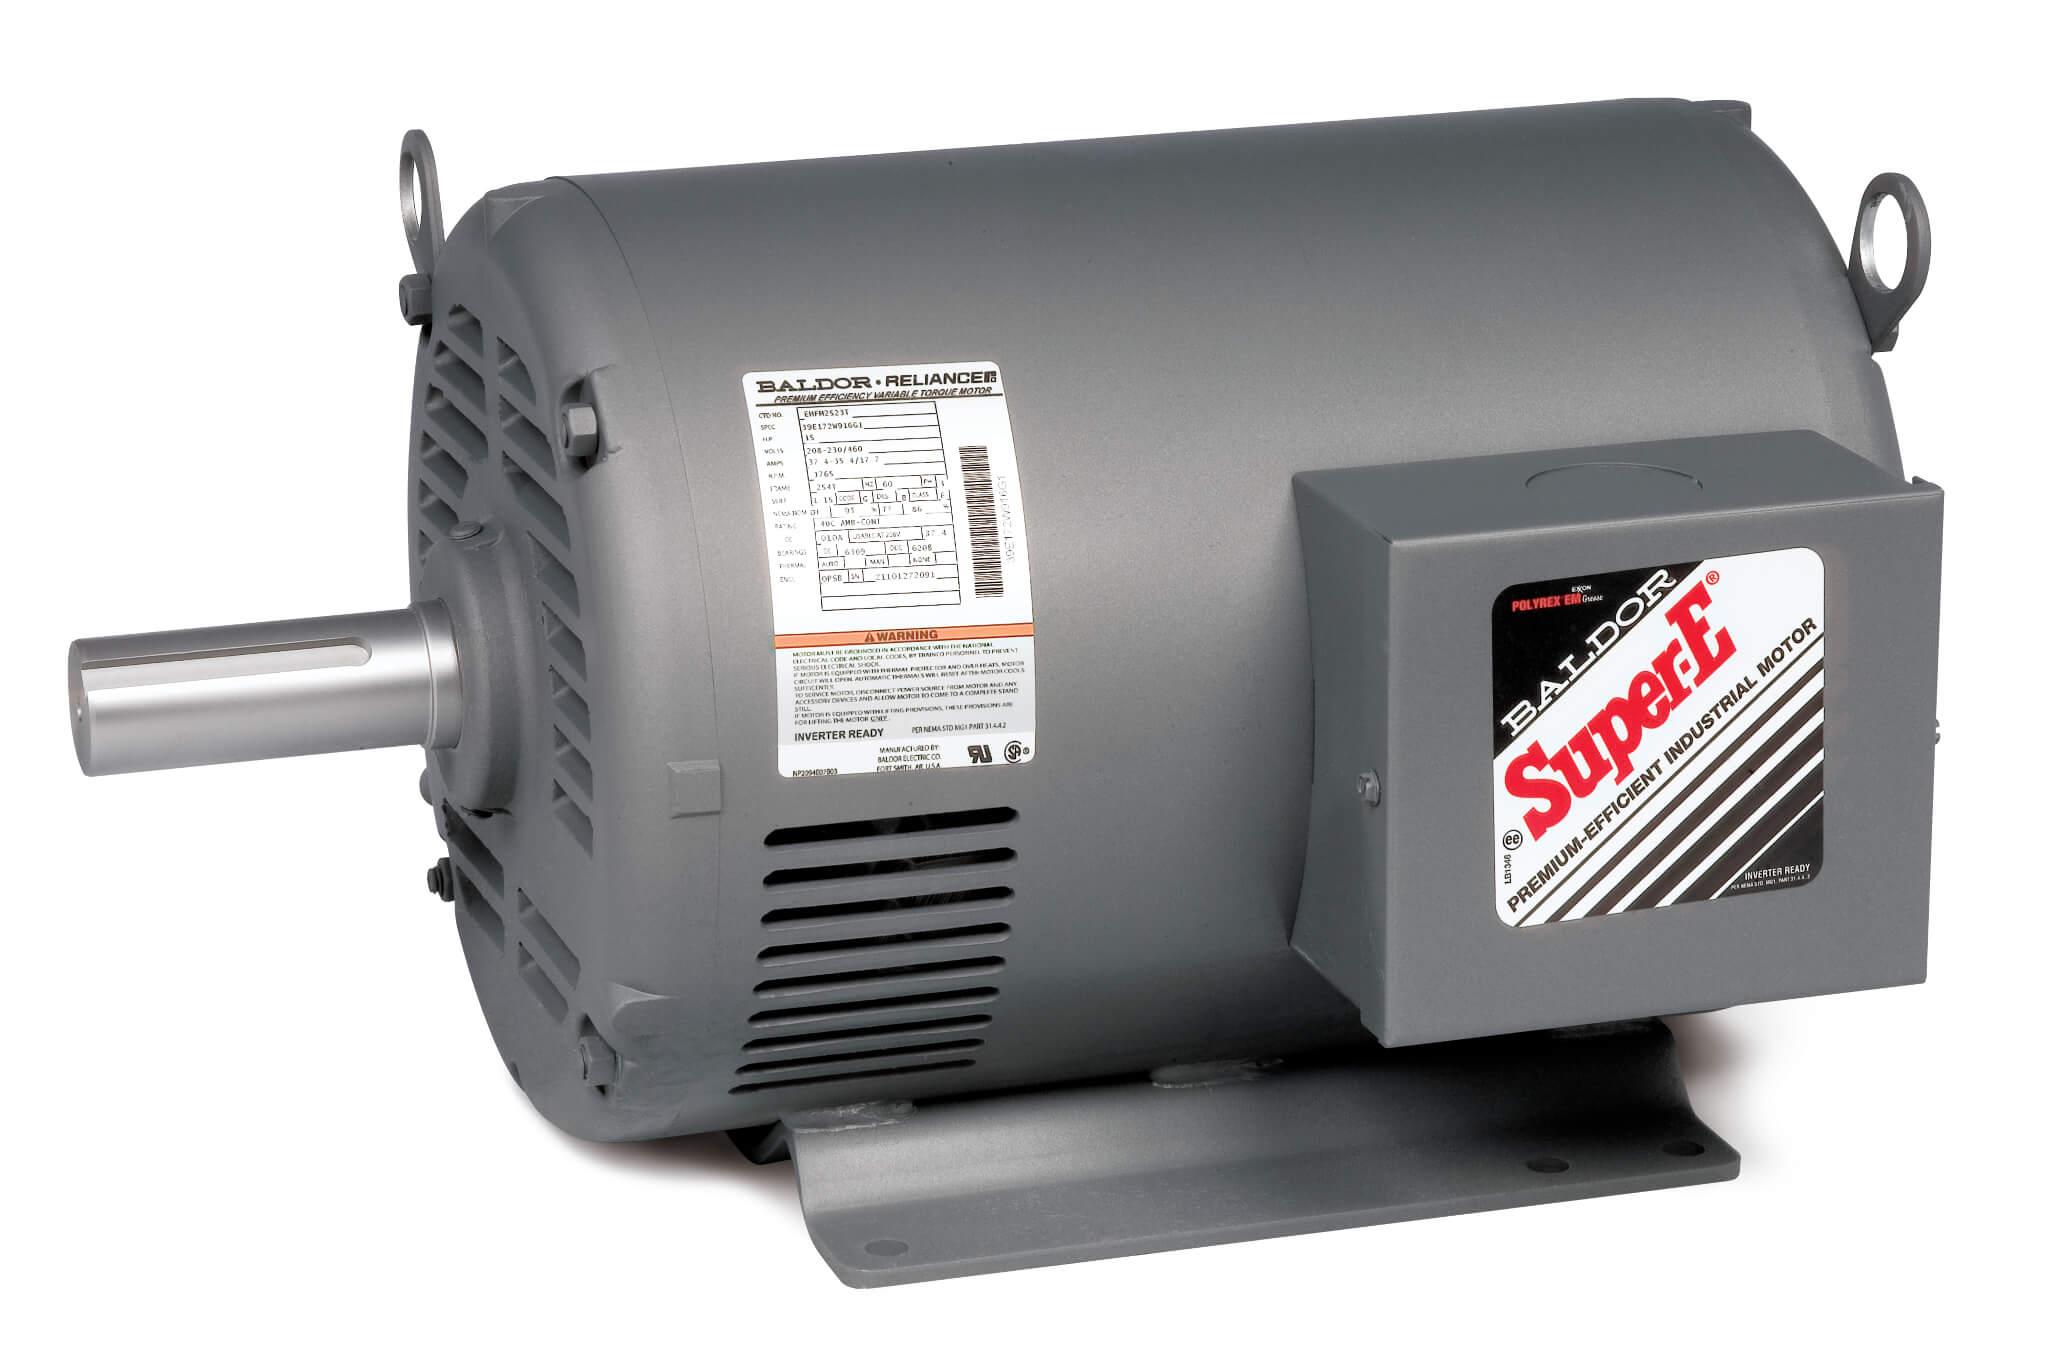 Baldor Motor Ehfm3211t Hvac Raptor Supplies Uk Motors General Purpose 230 460v 1800 Rpm 3 Hp 60 Hz Odp 182t